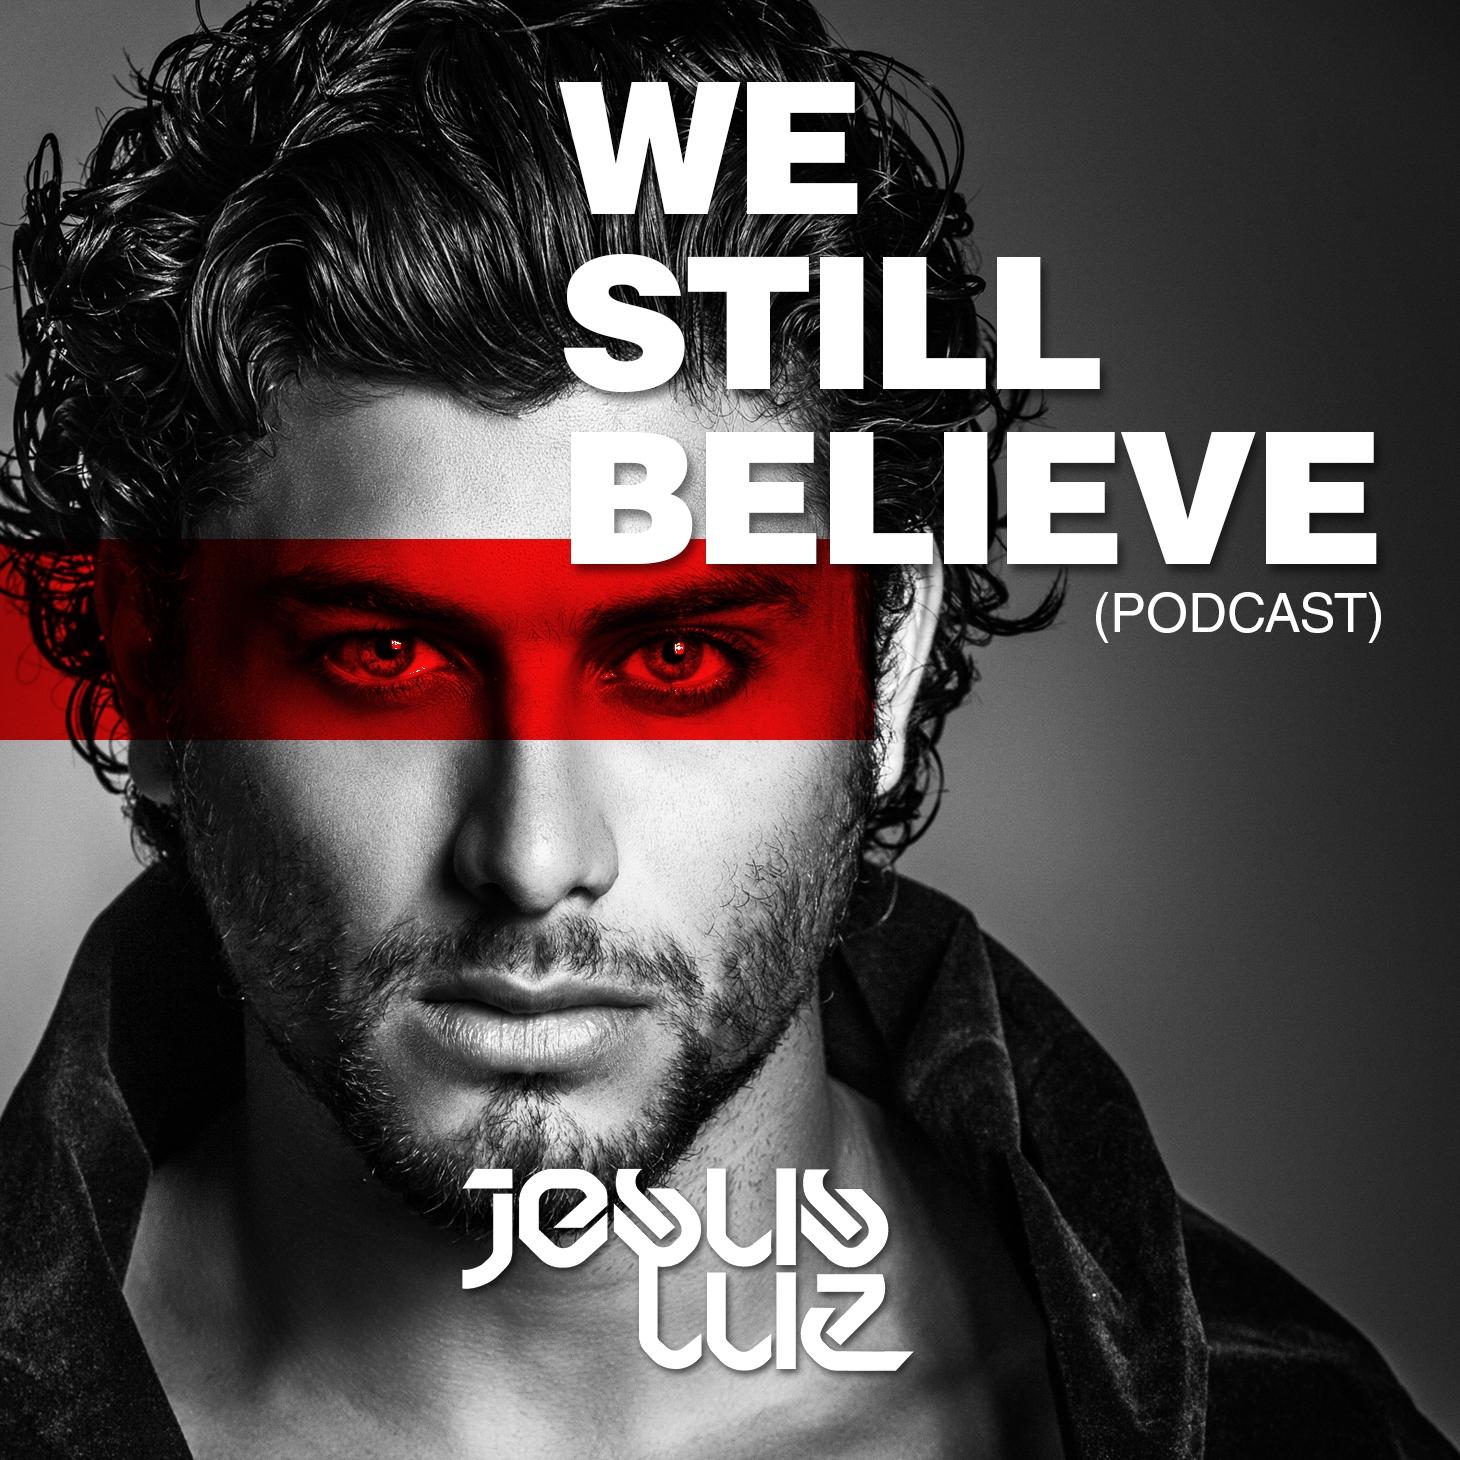 Jesus Luz - We Still Believe (Podcast)